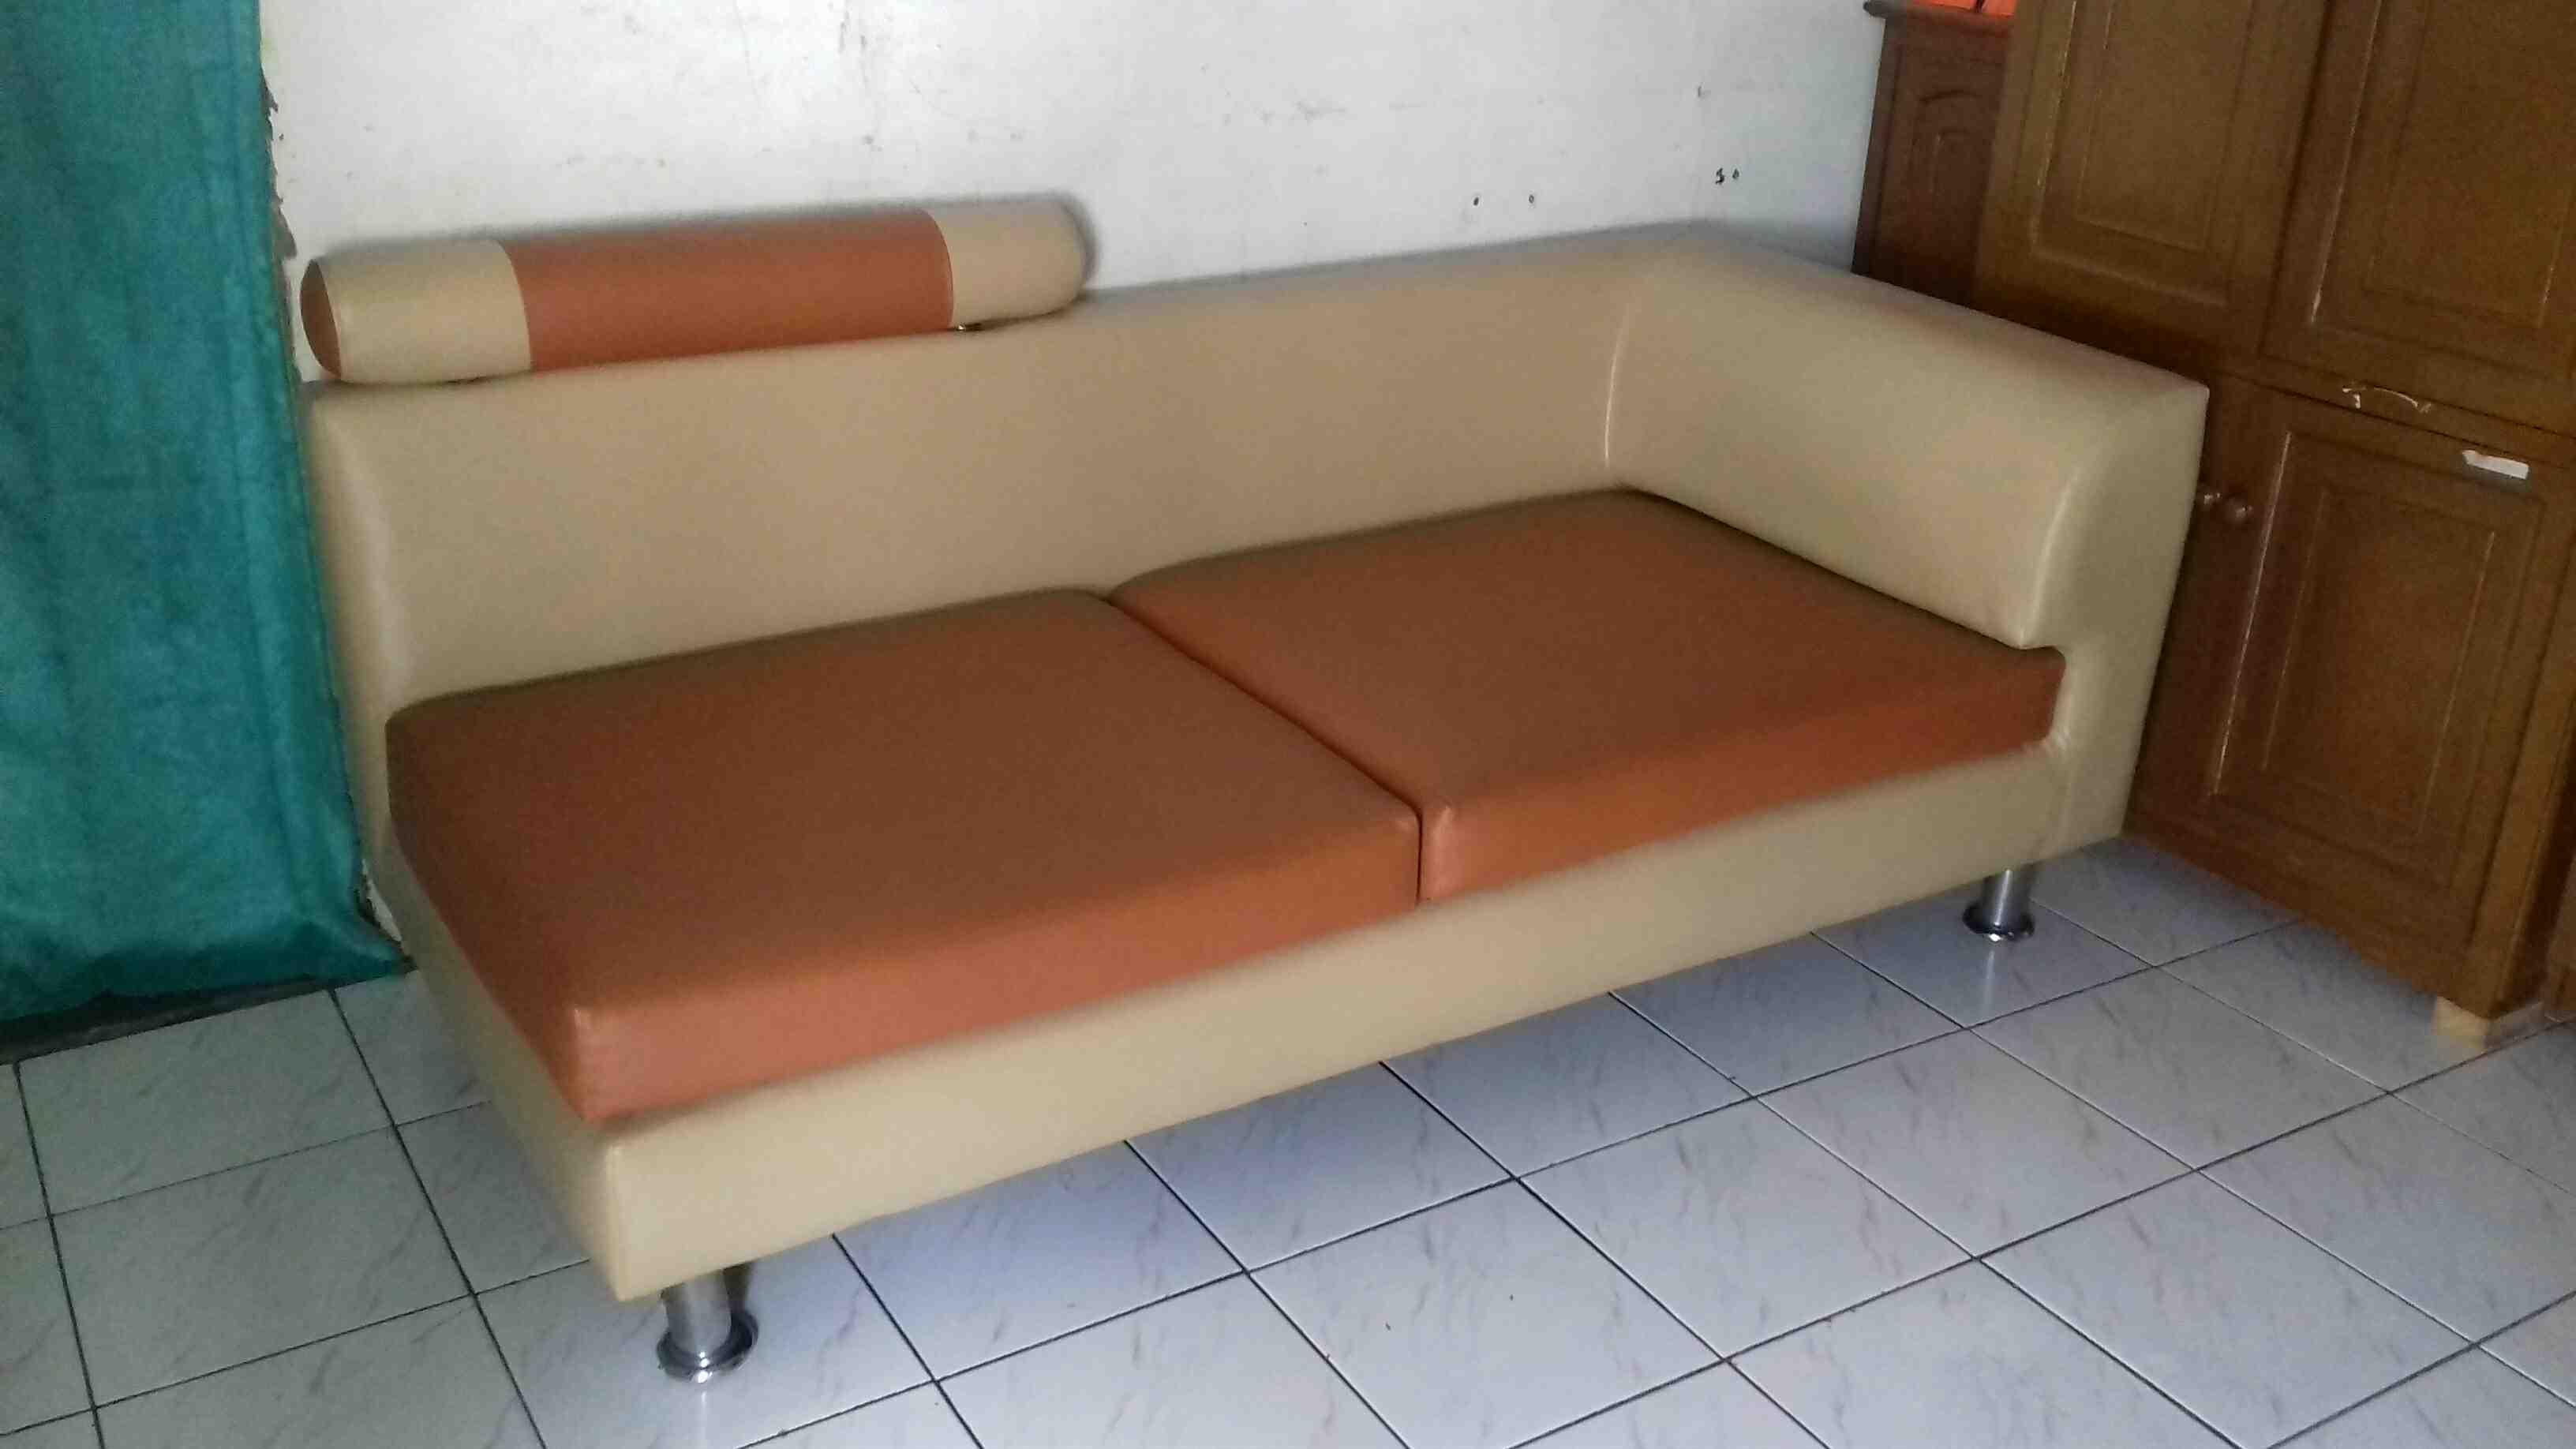 Foto: Merubah Sofa Lama Anda Menjadi Baru Lagi